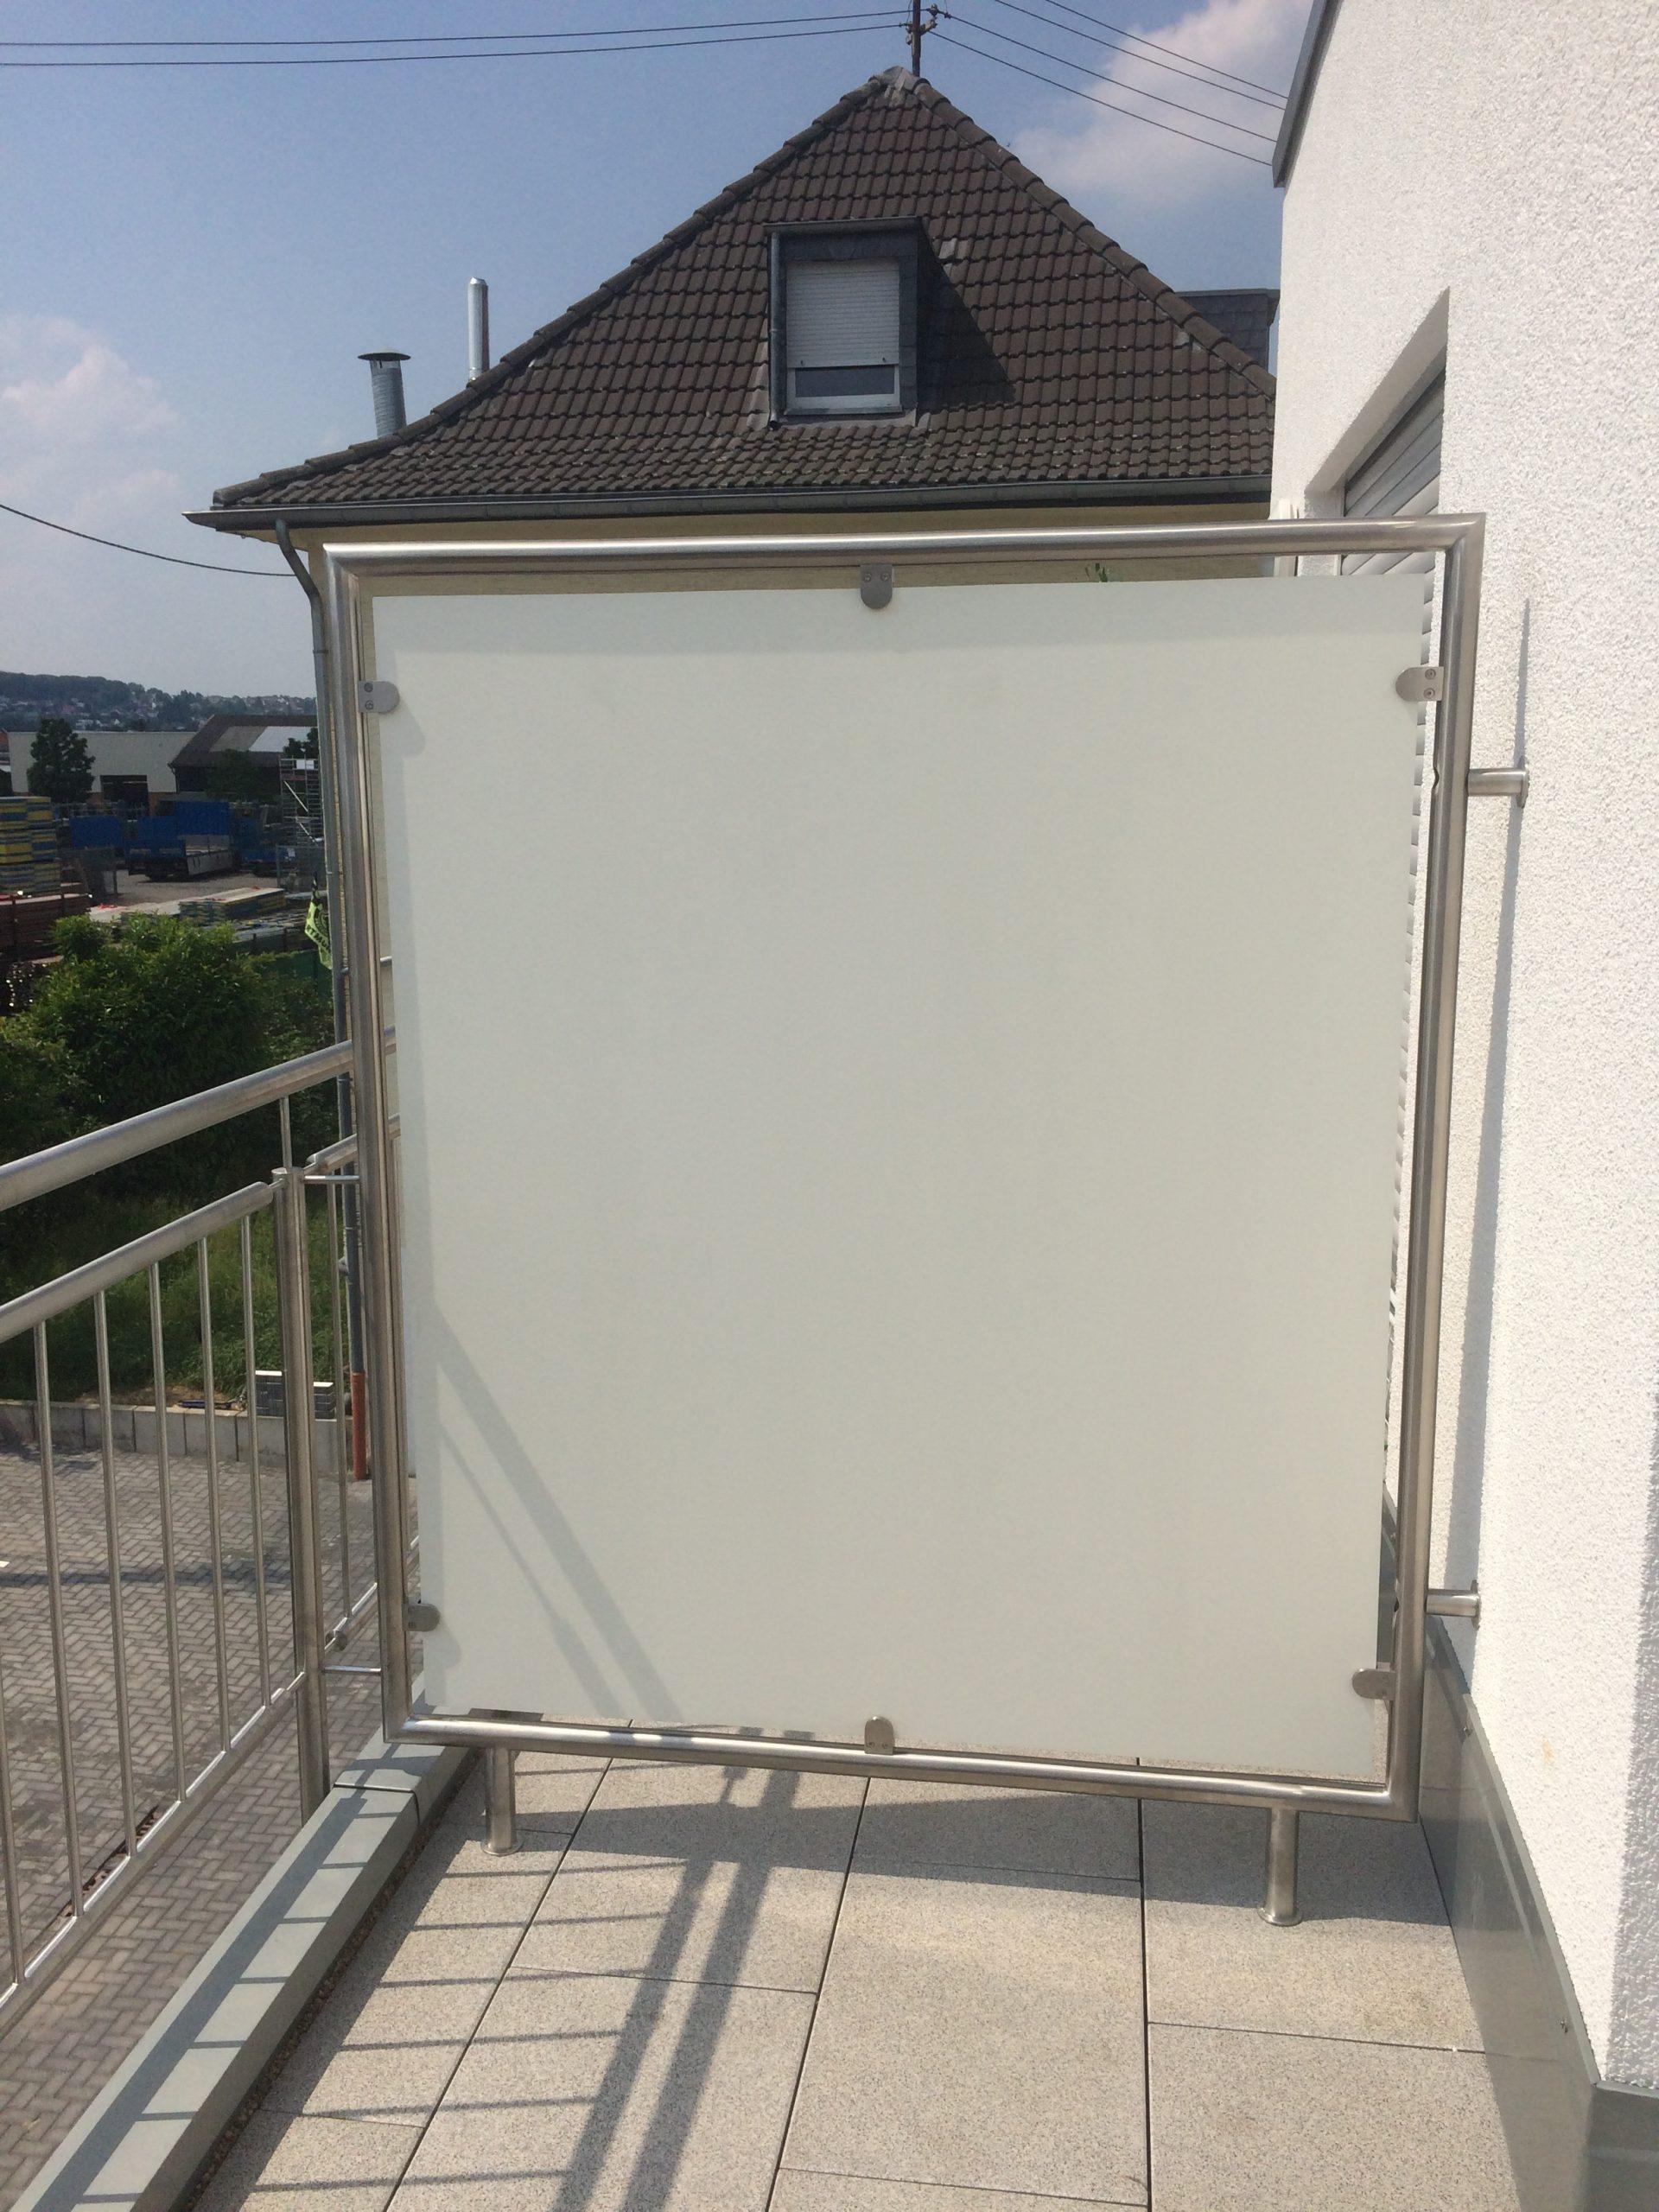 Full Size of Trennwand Balkon Edelstahlgelnder Va Prinz Metallbau Gmbh Garten Glastrennwand Dusche Wohnzimmer Trennwand Balkon